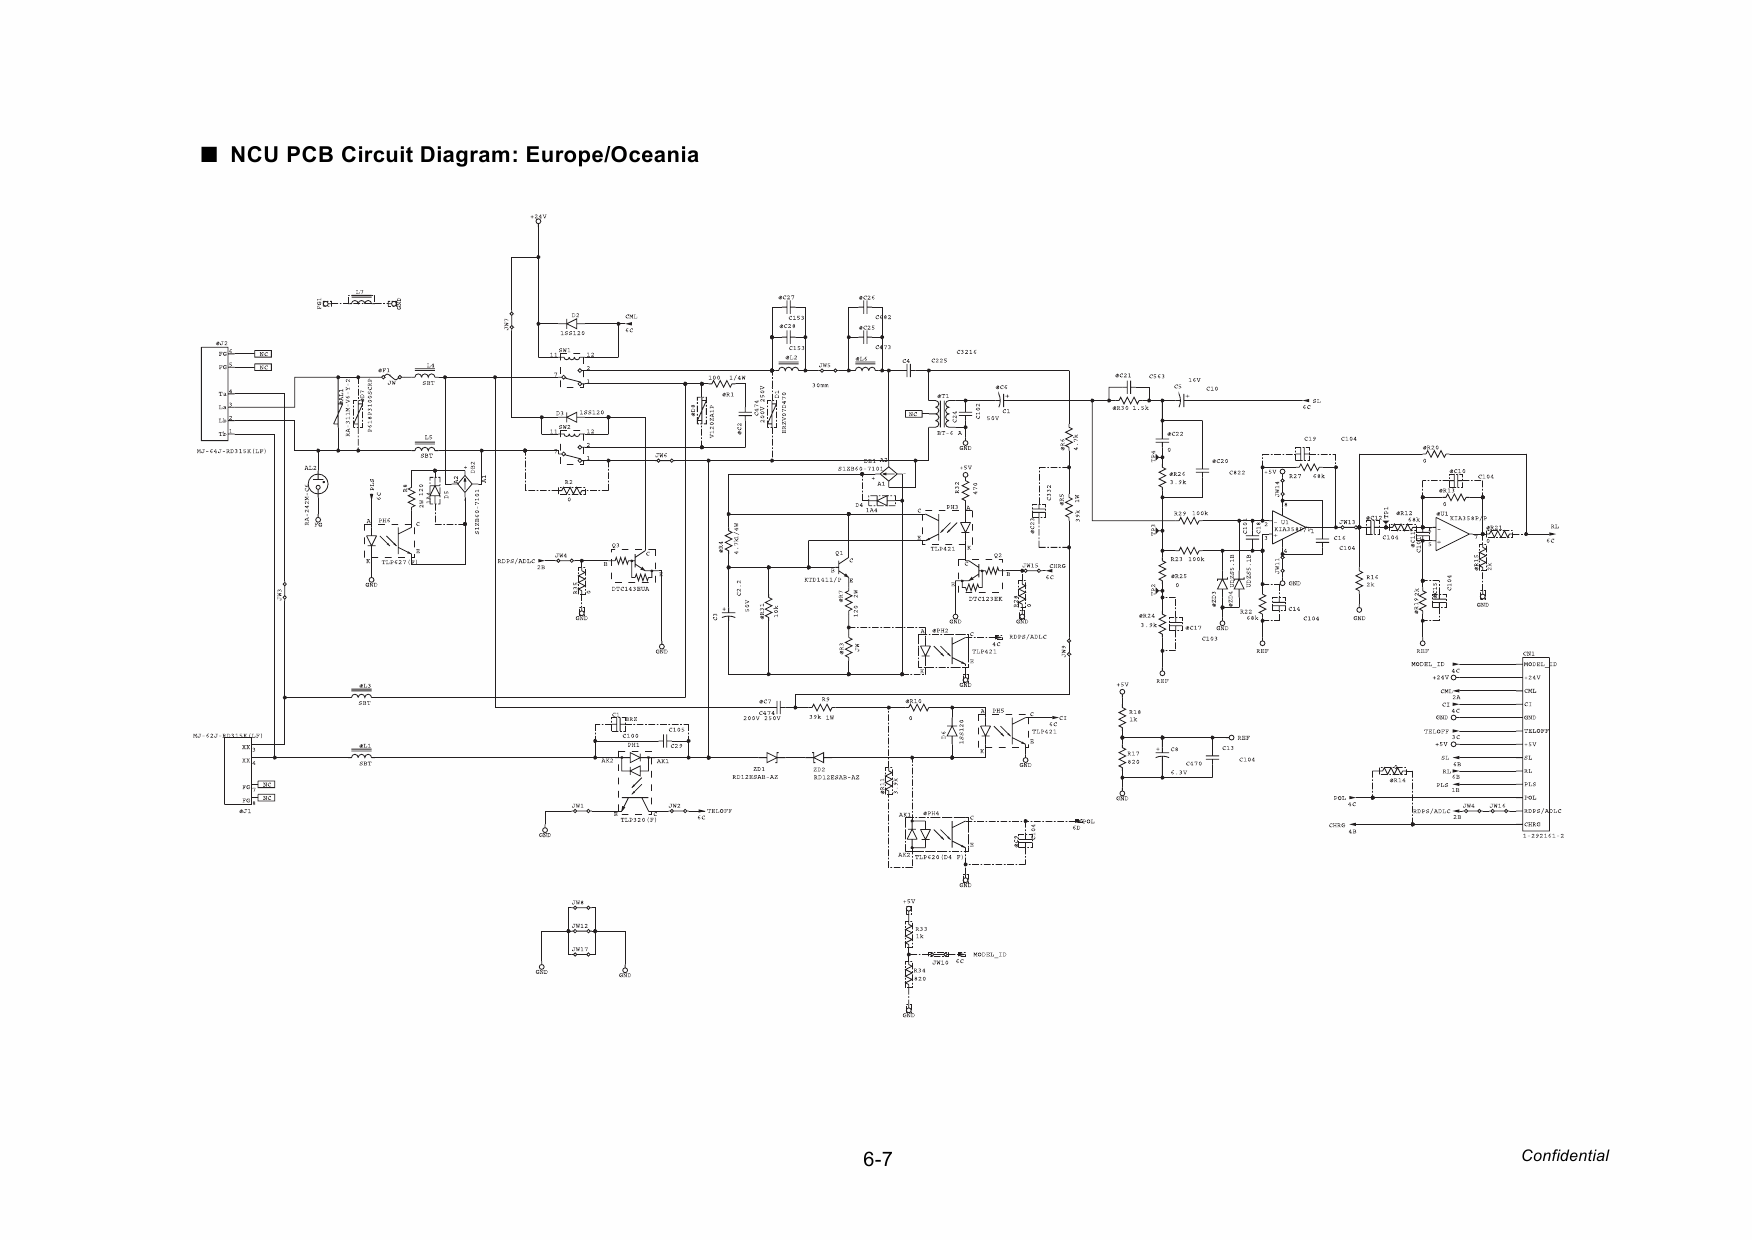 brother mfc 9970cdw manual pdf